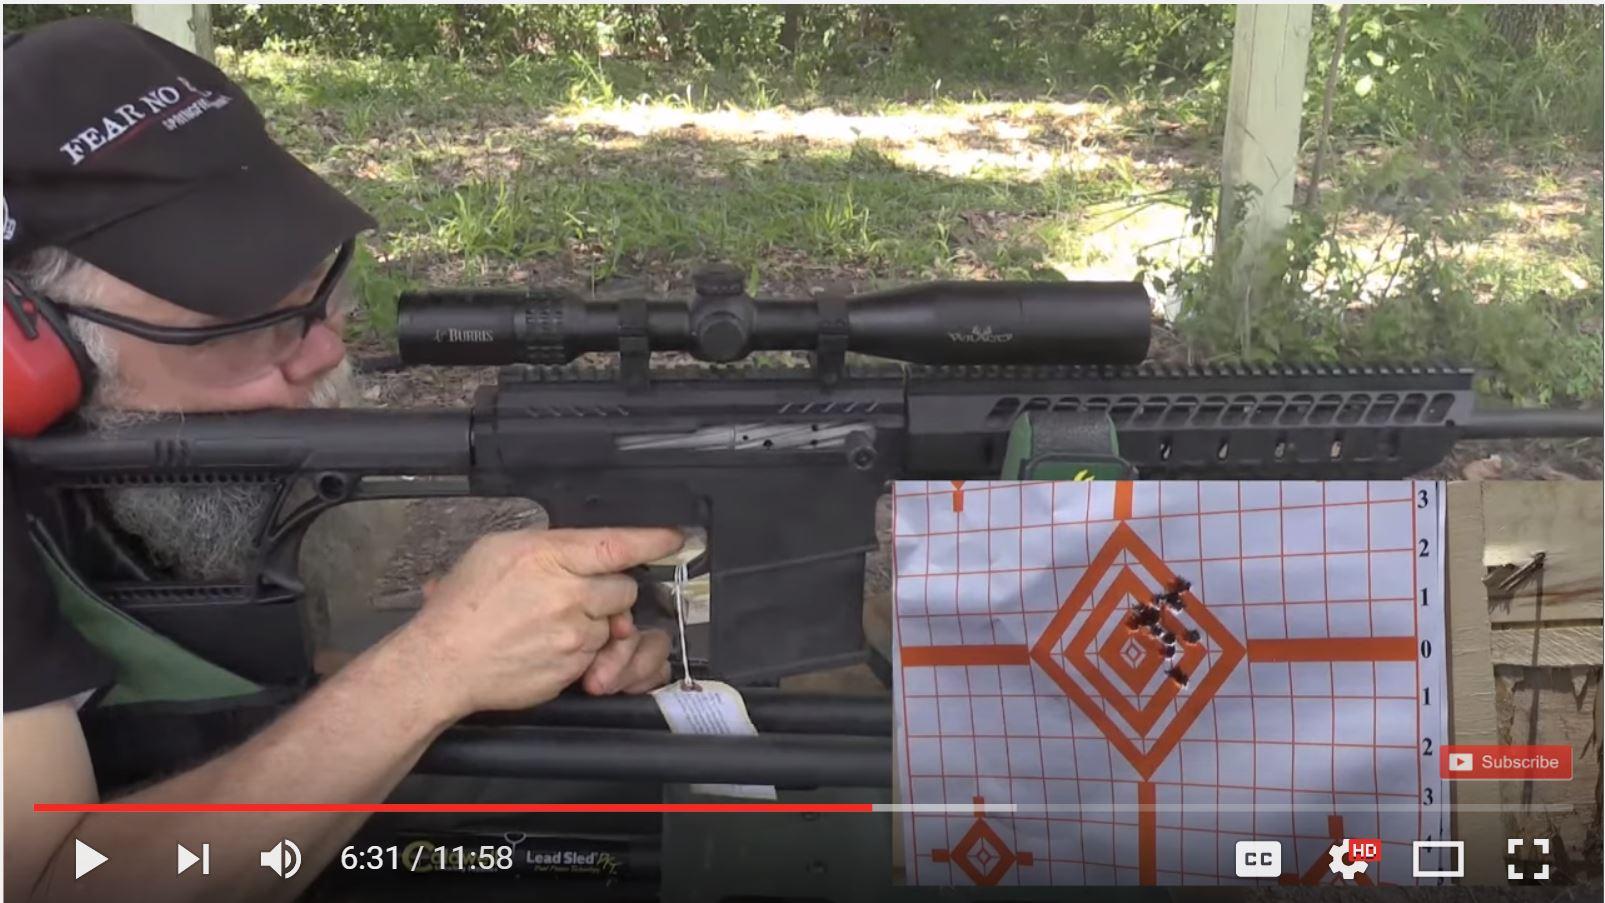 long range assassin is 30 06 semi auto ar 15 noreen bn36